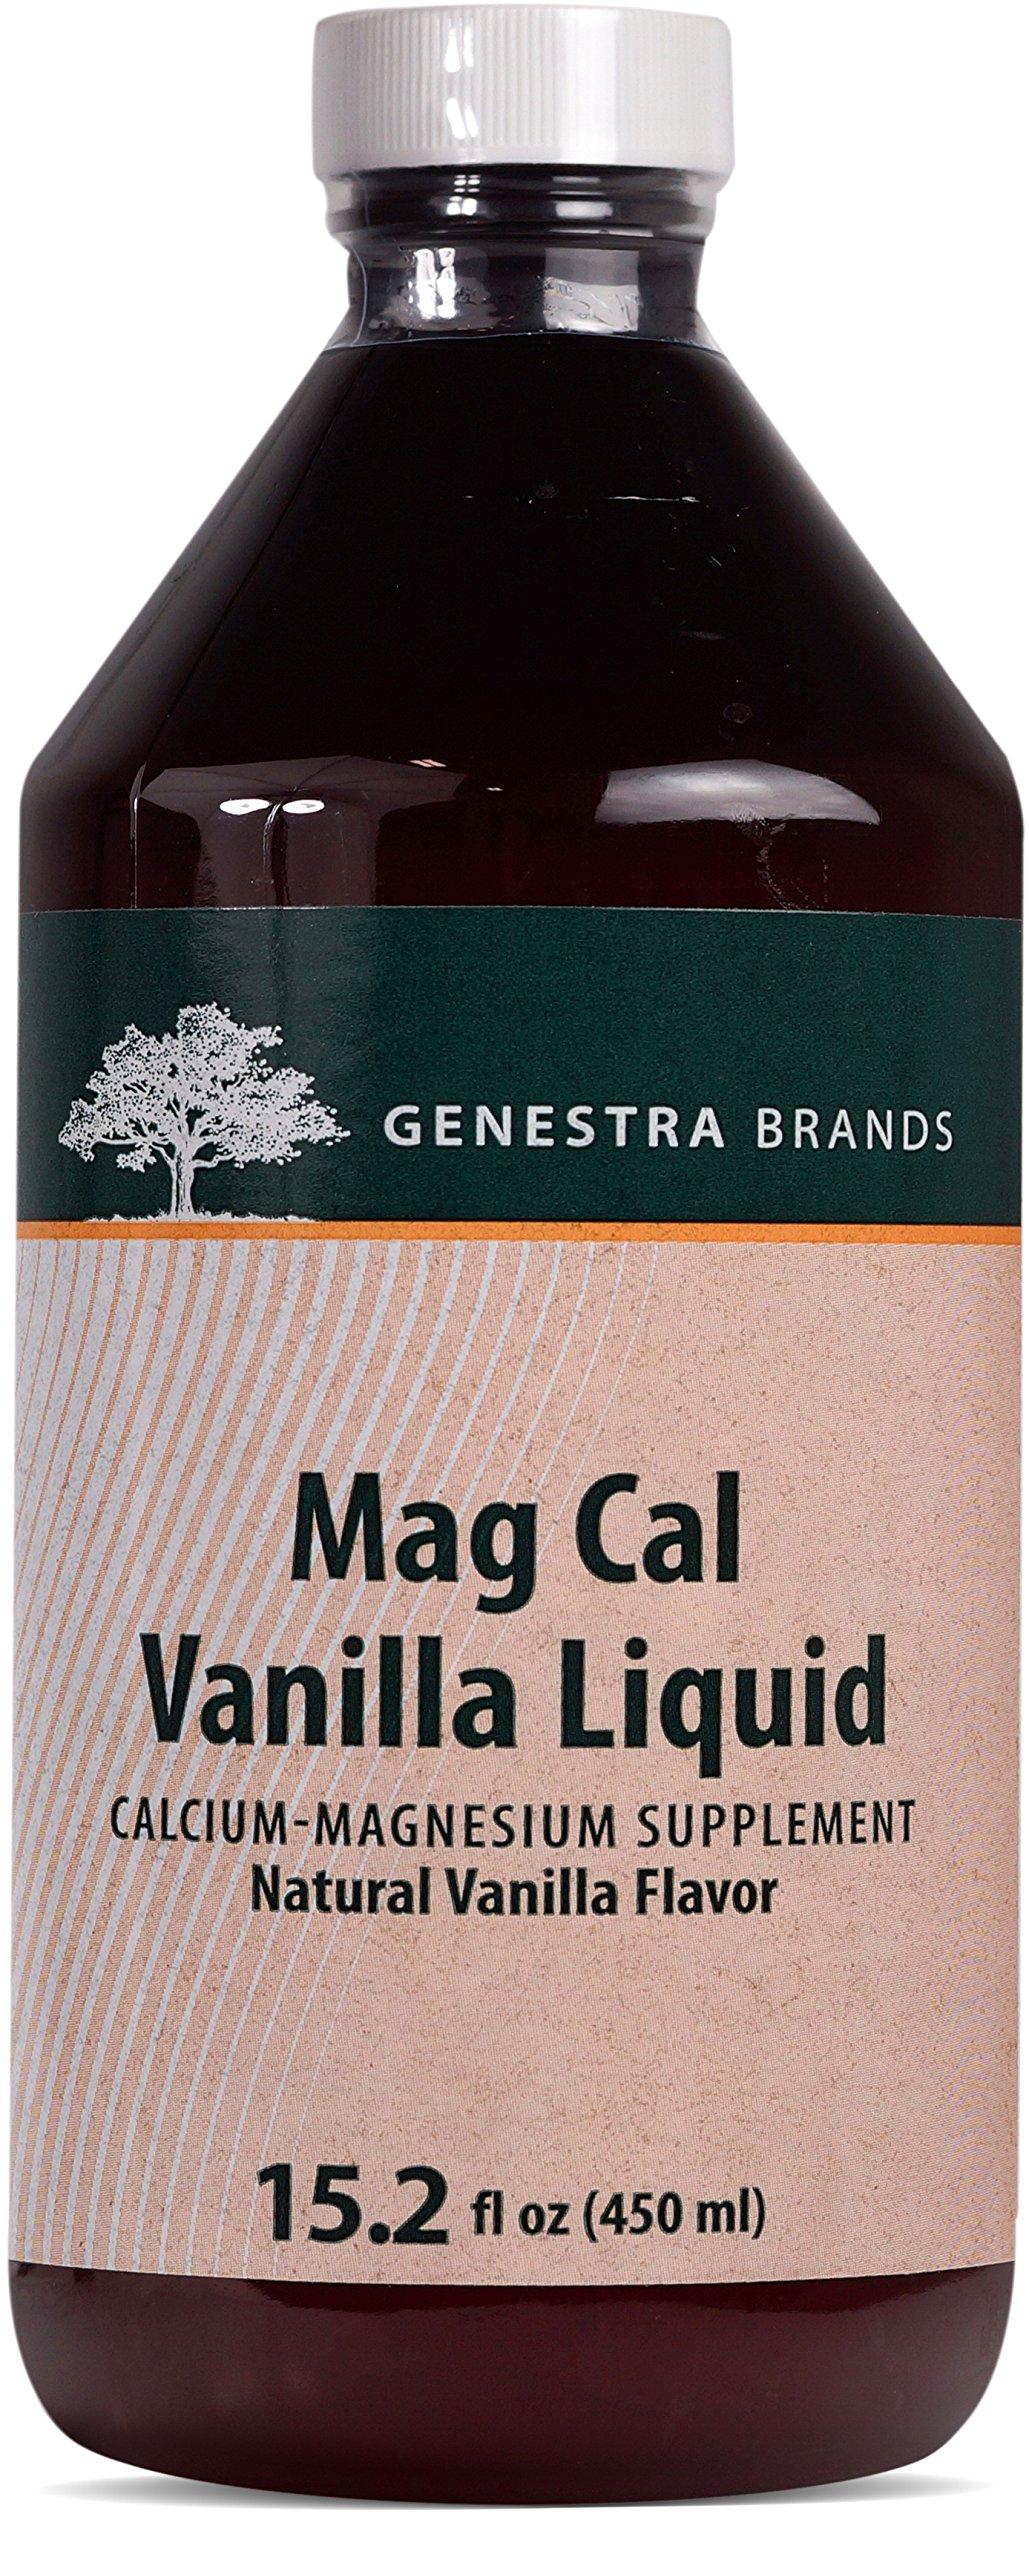 Genestra Brands - Mag Cal Vanilla Liquid - Calcium-Magnesium Supplement - Natural Vanilla Flavor - 15.2 fl oz (450 ml)